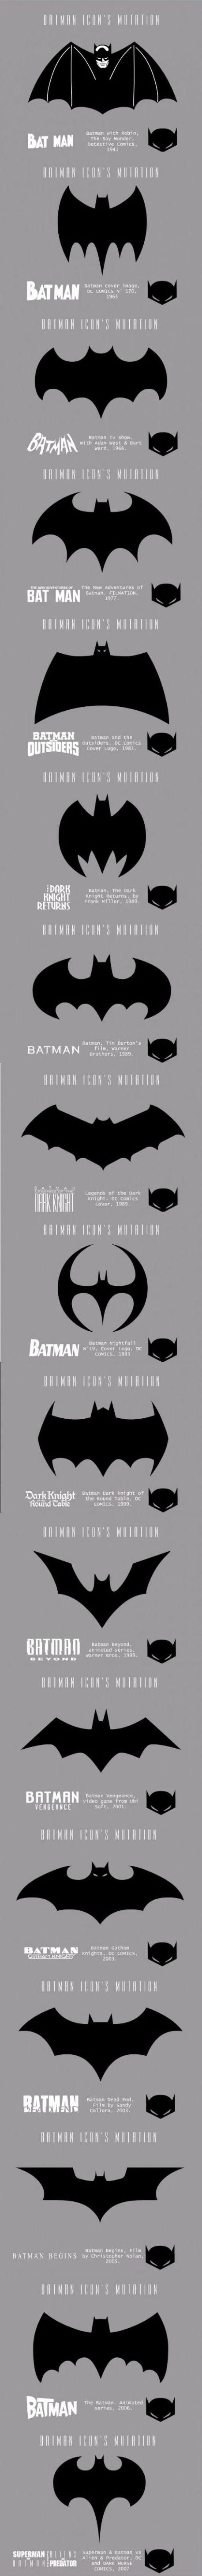 Evolution of the Batman Symbol